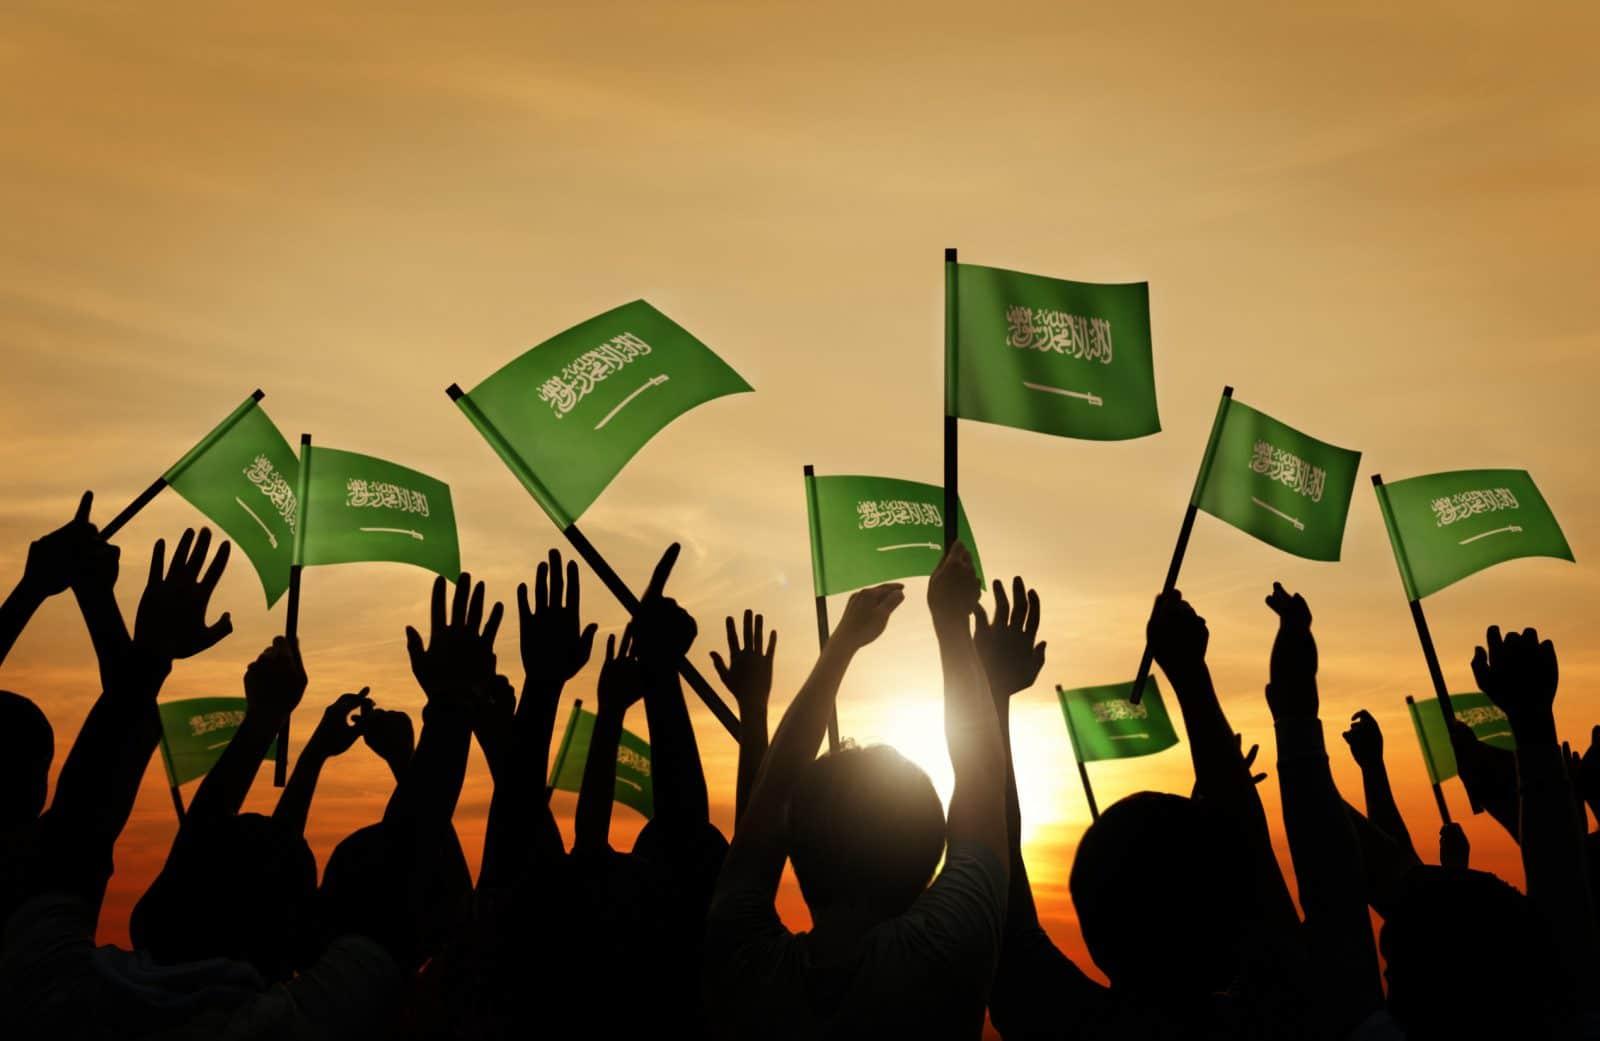 Significado da Bandeira da Arábia Saudita